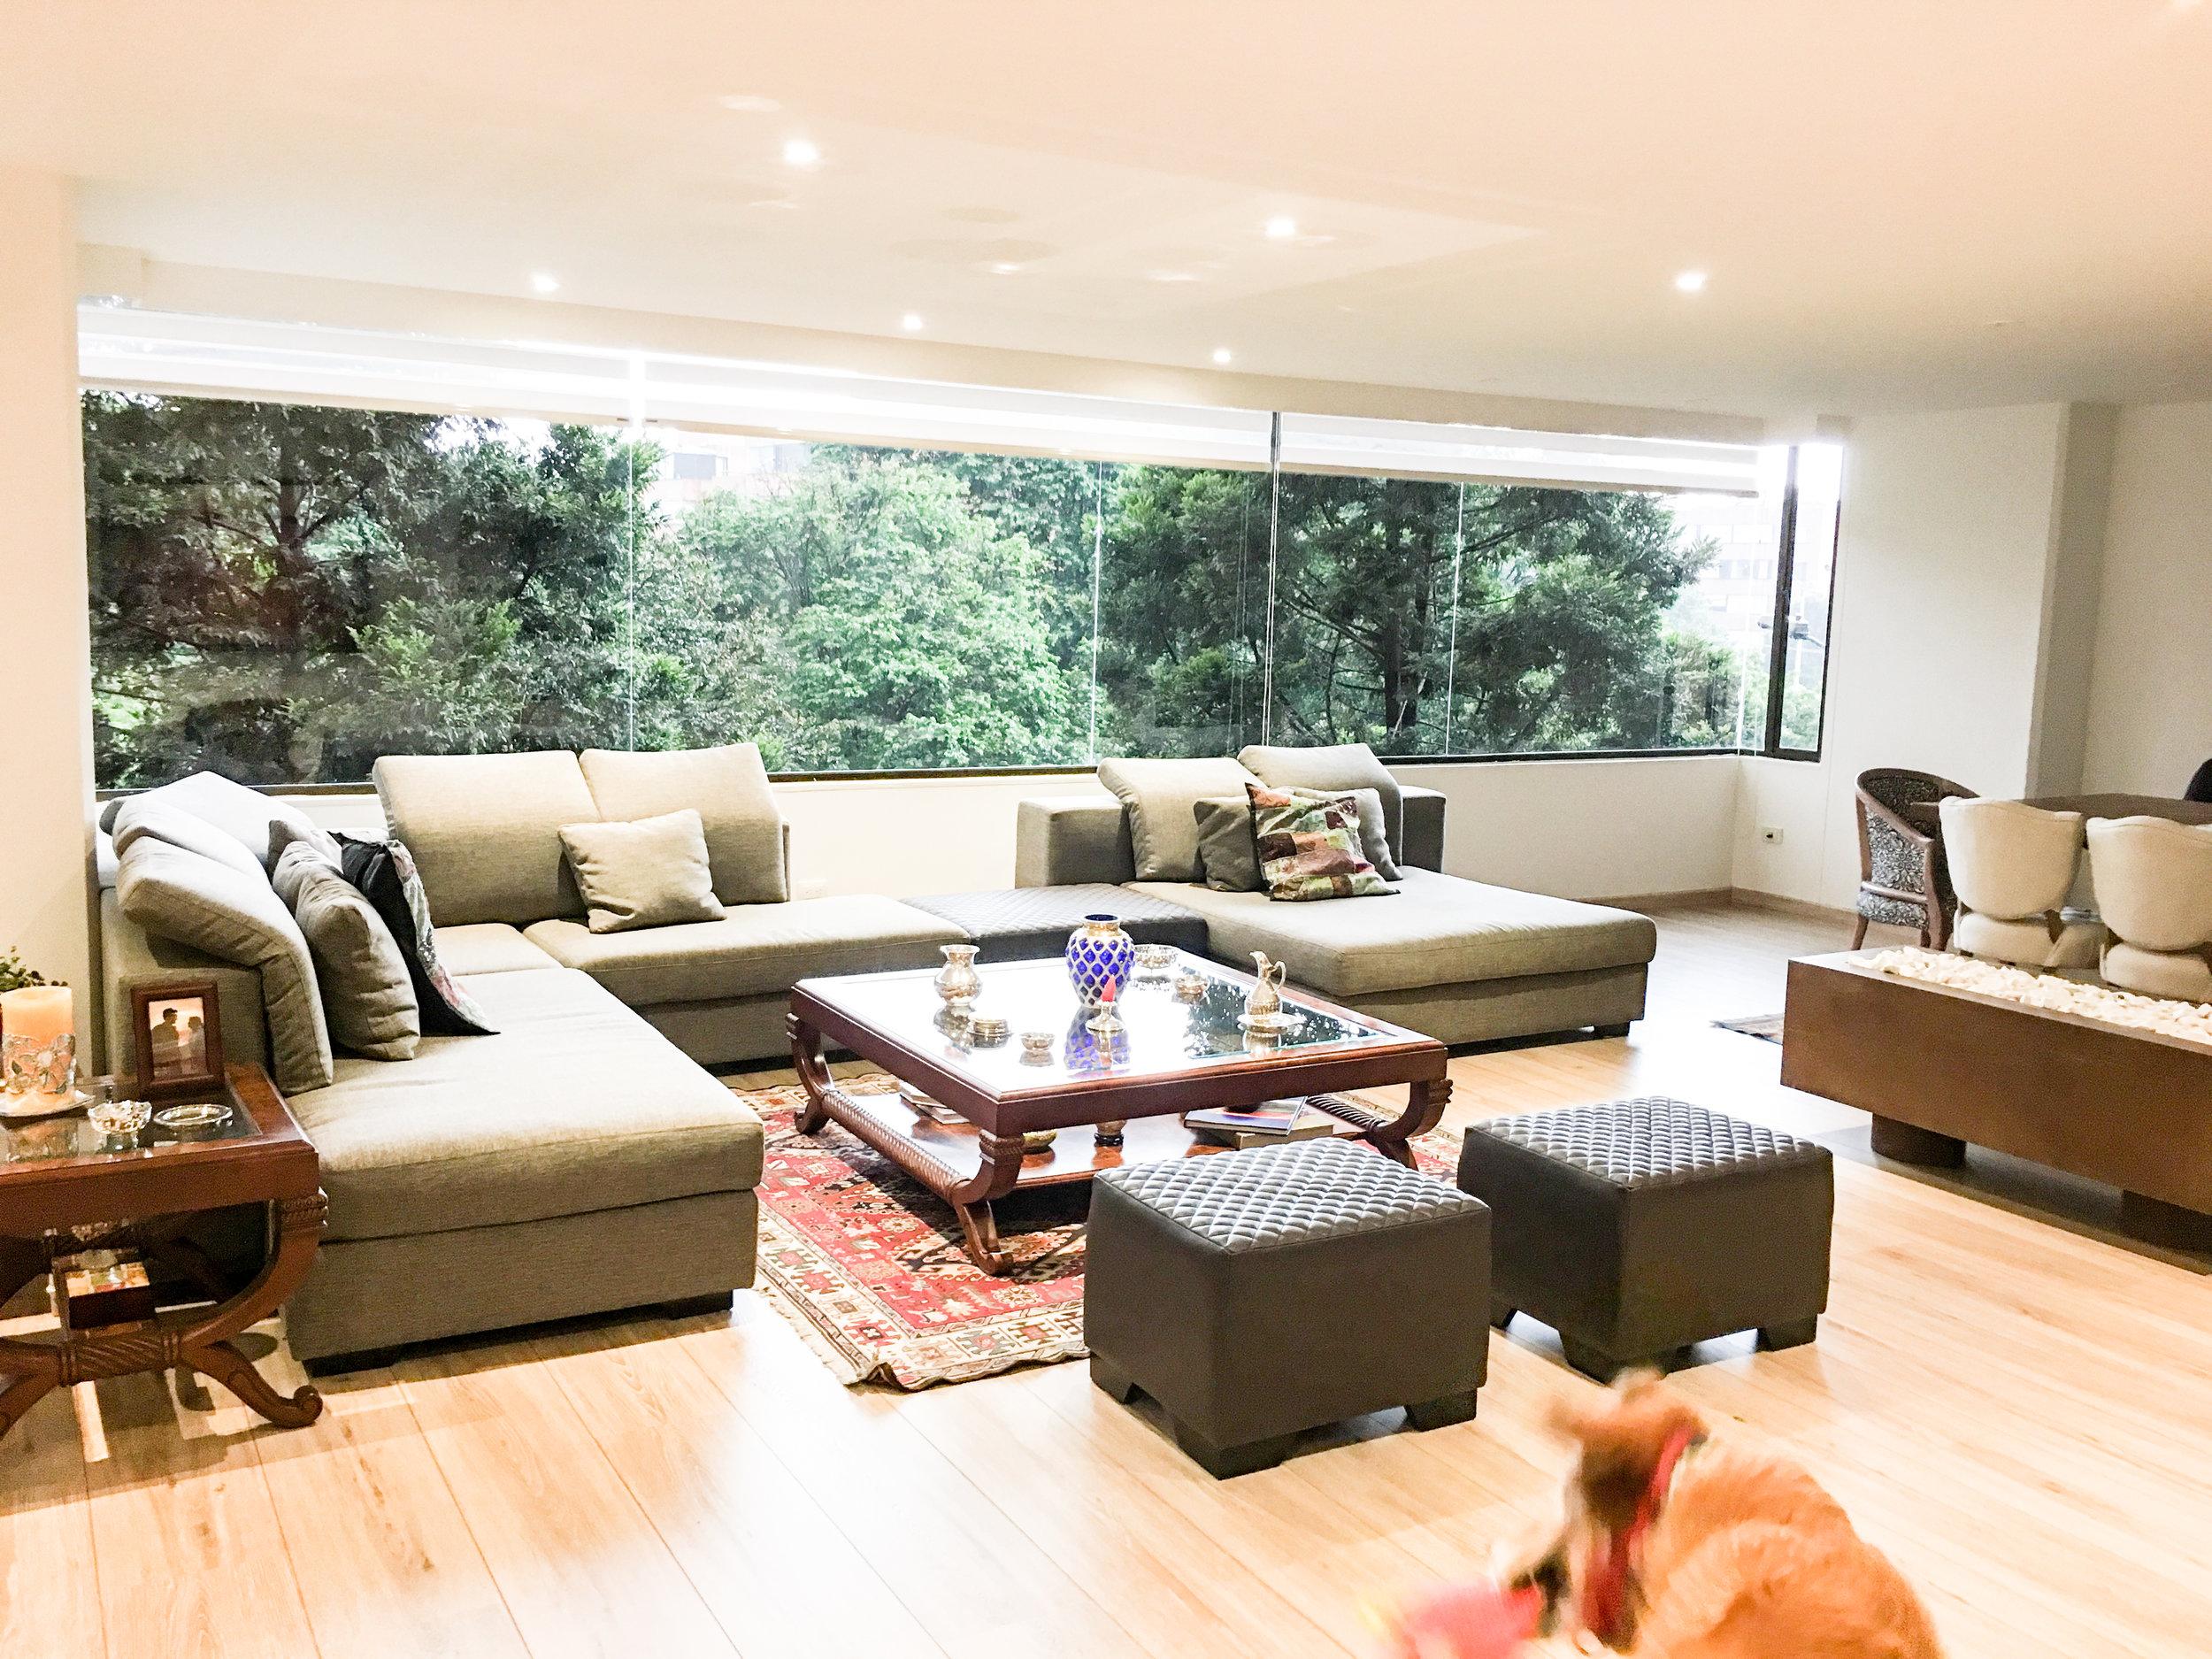 Living Room with Milano Modular Sofa